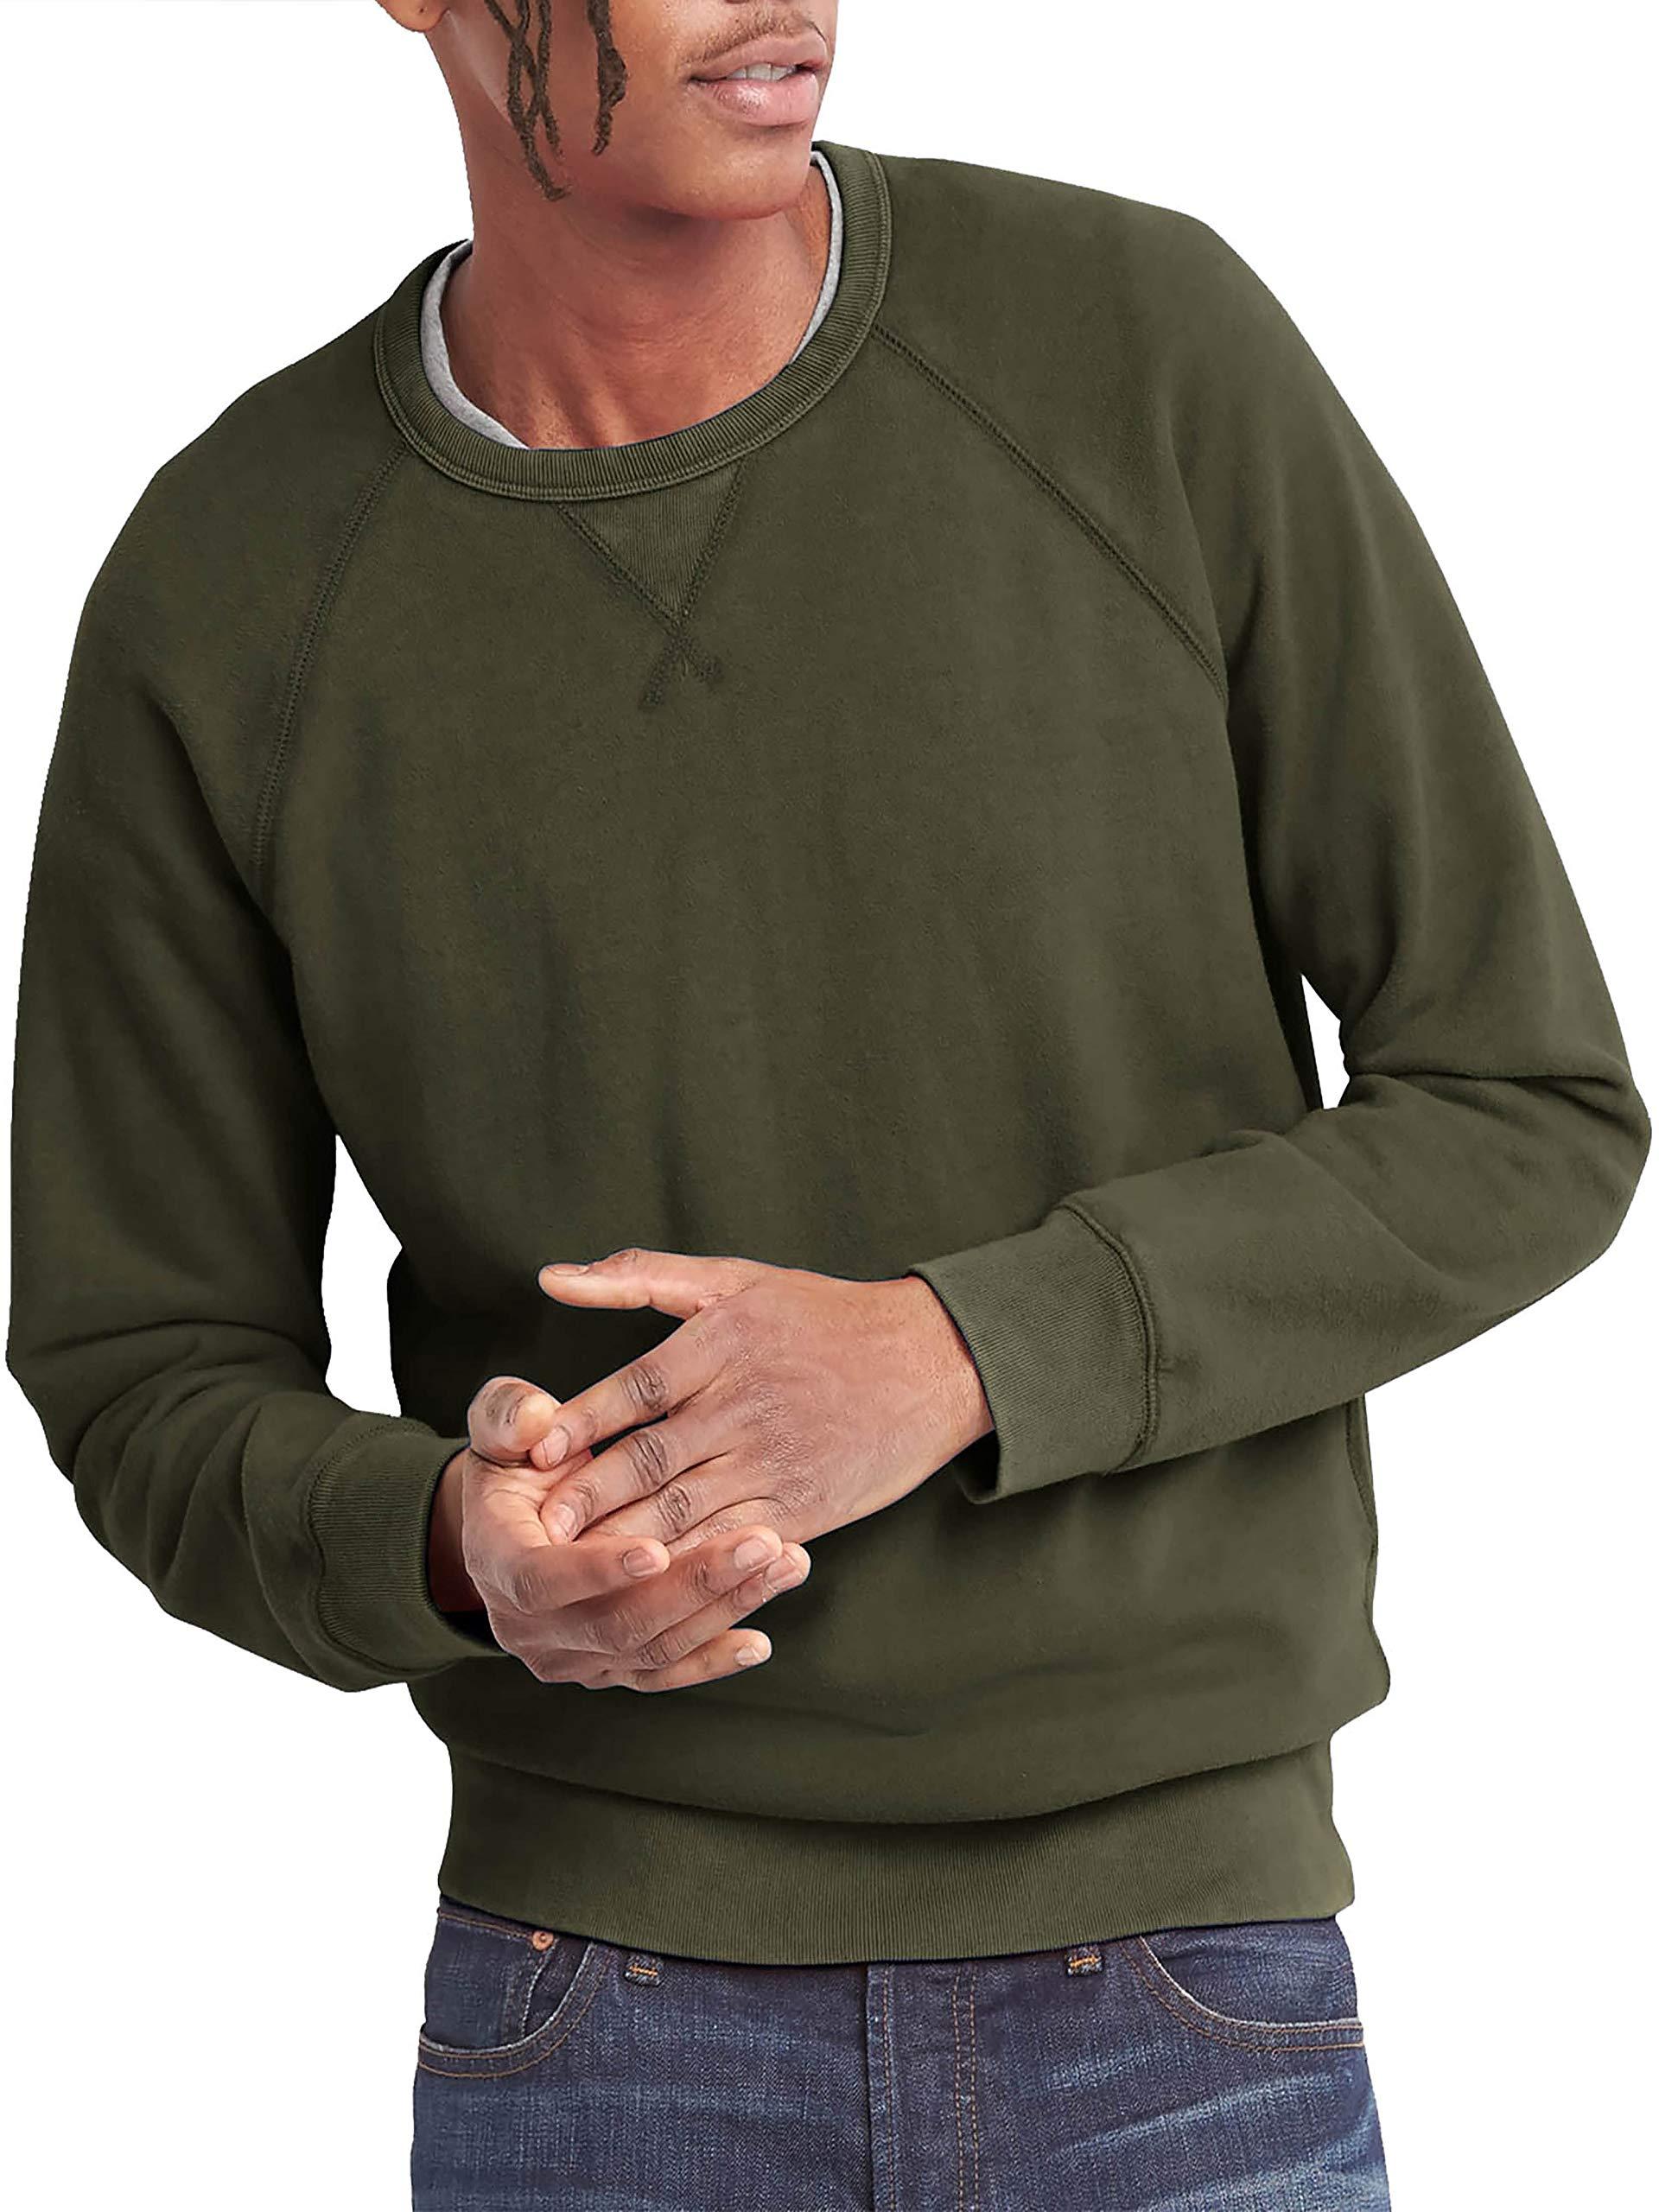 Hat and Beyond Mens French Terry Crewneck Sweatshirt Lightweight Fleece Pullover Sweater